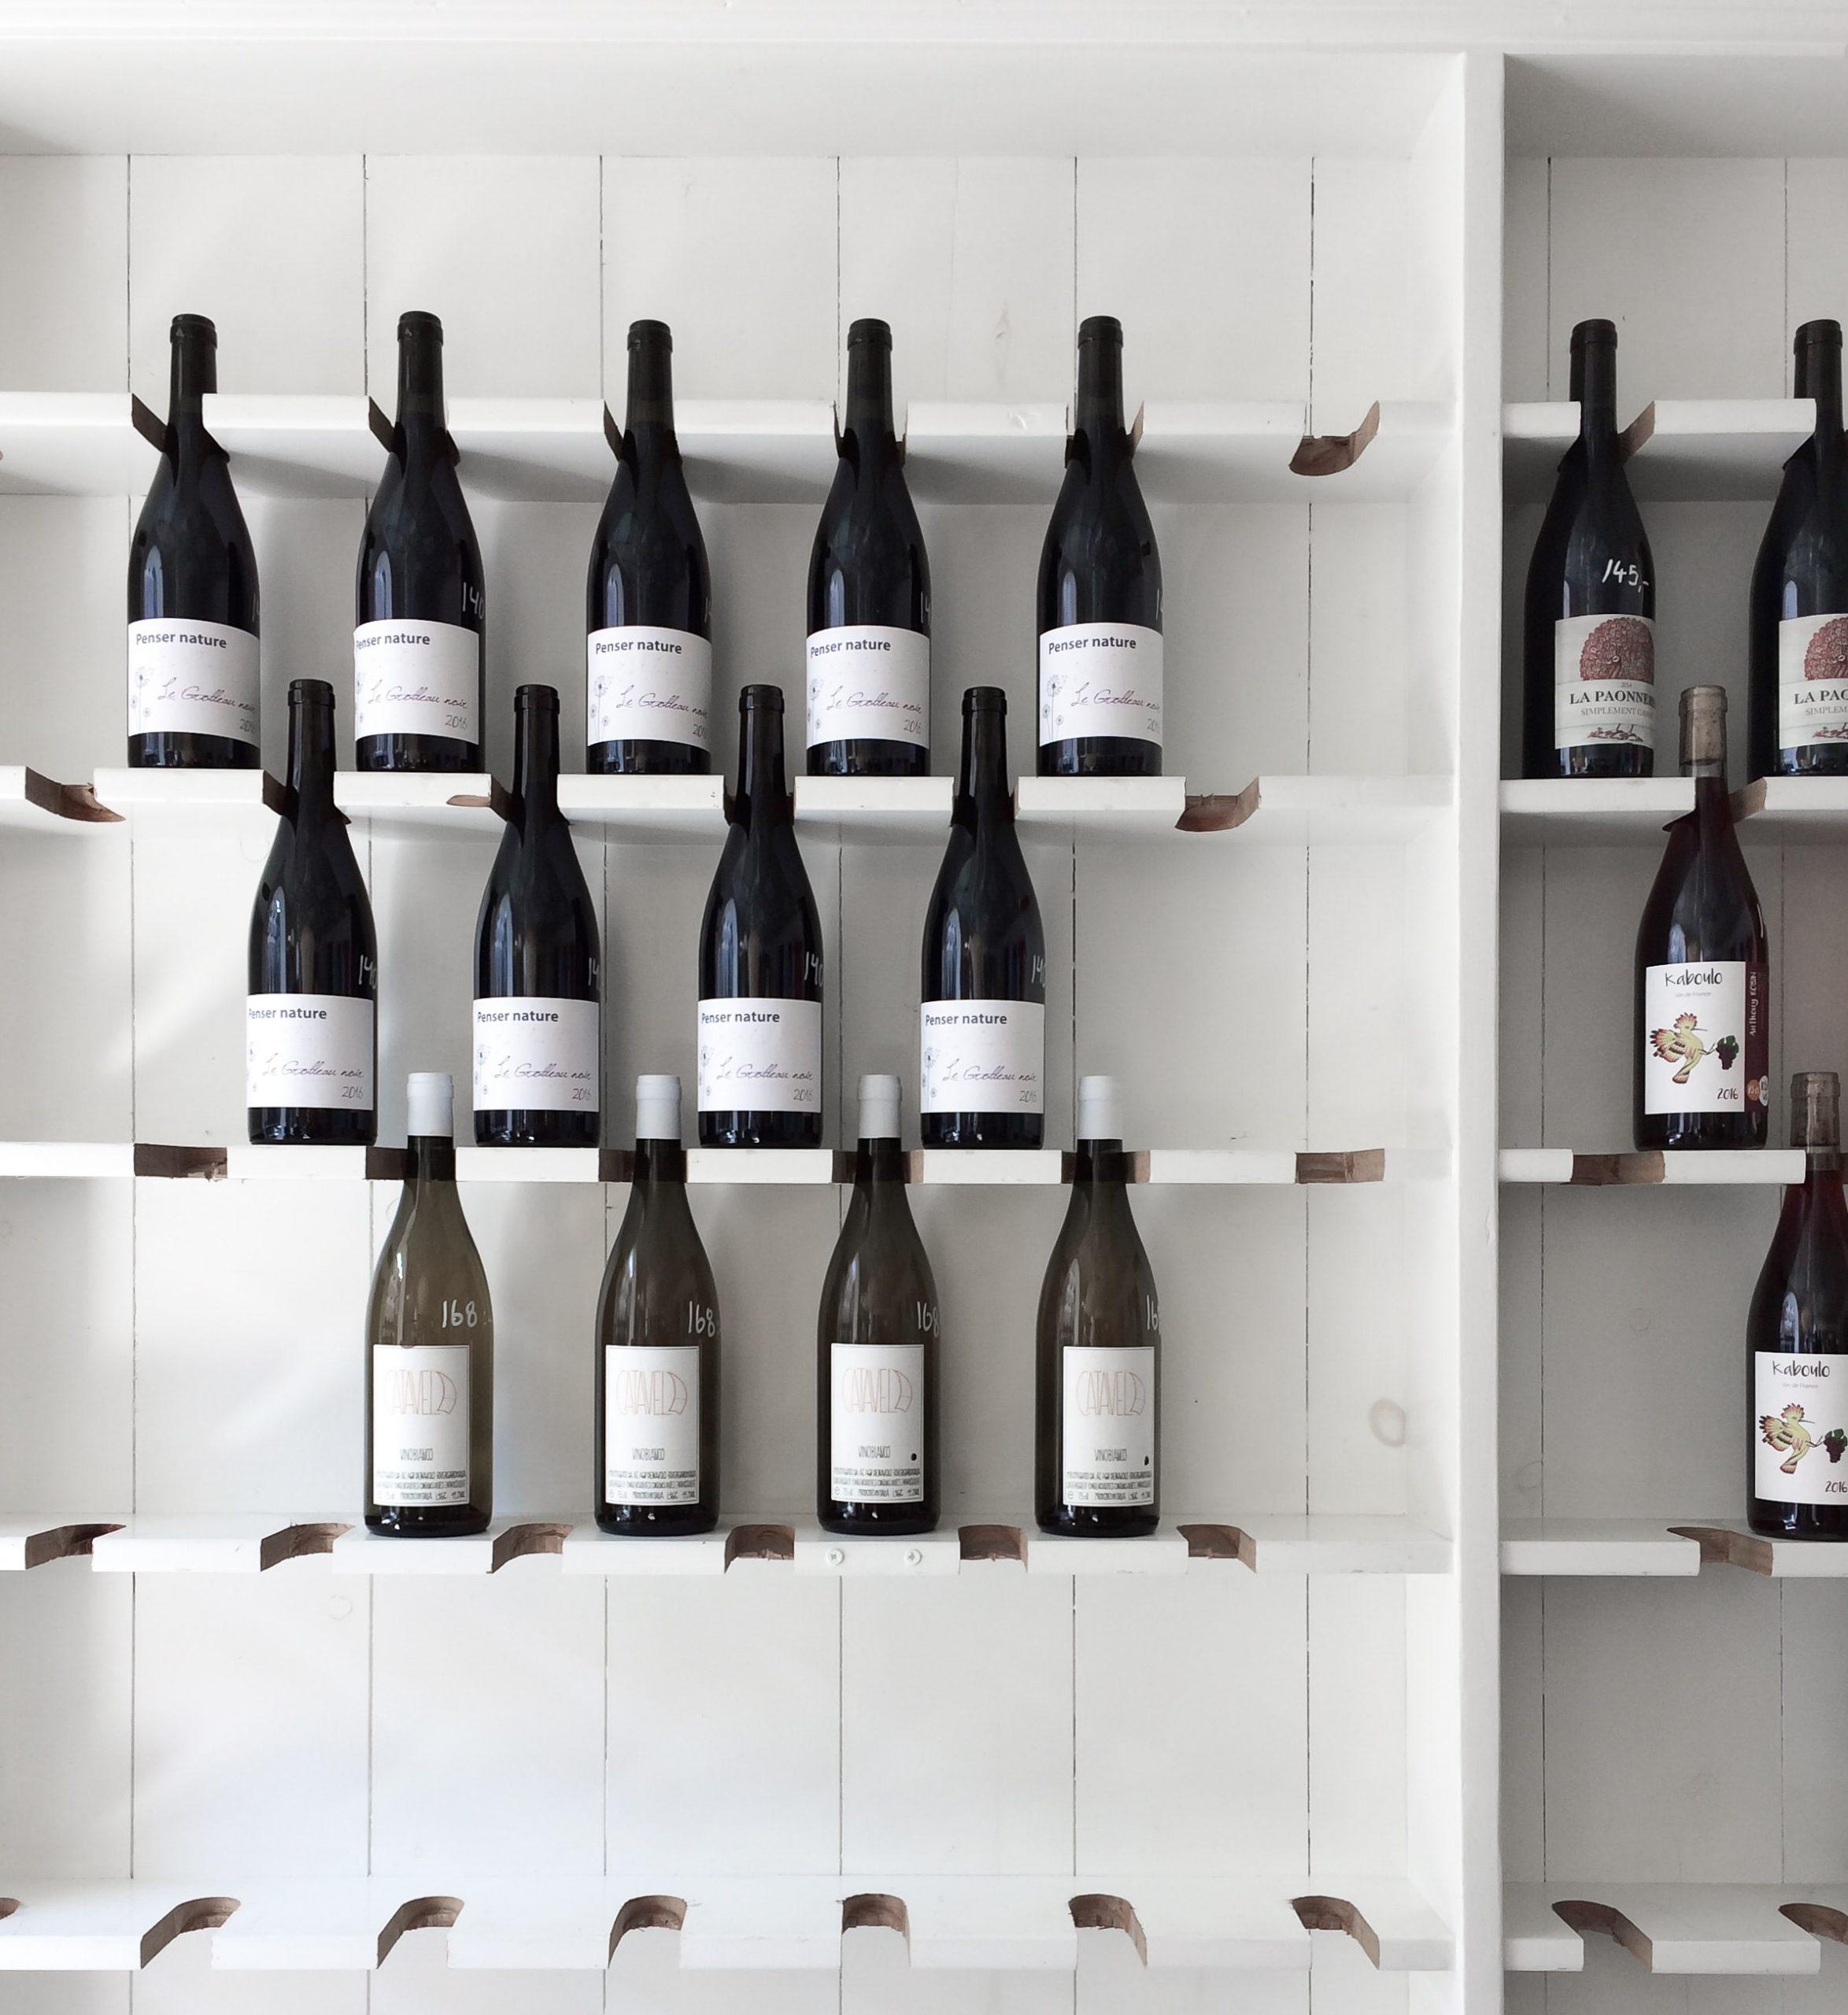 2021 vintage wine shortages